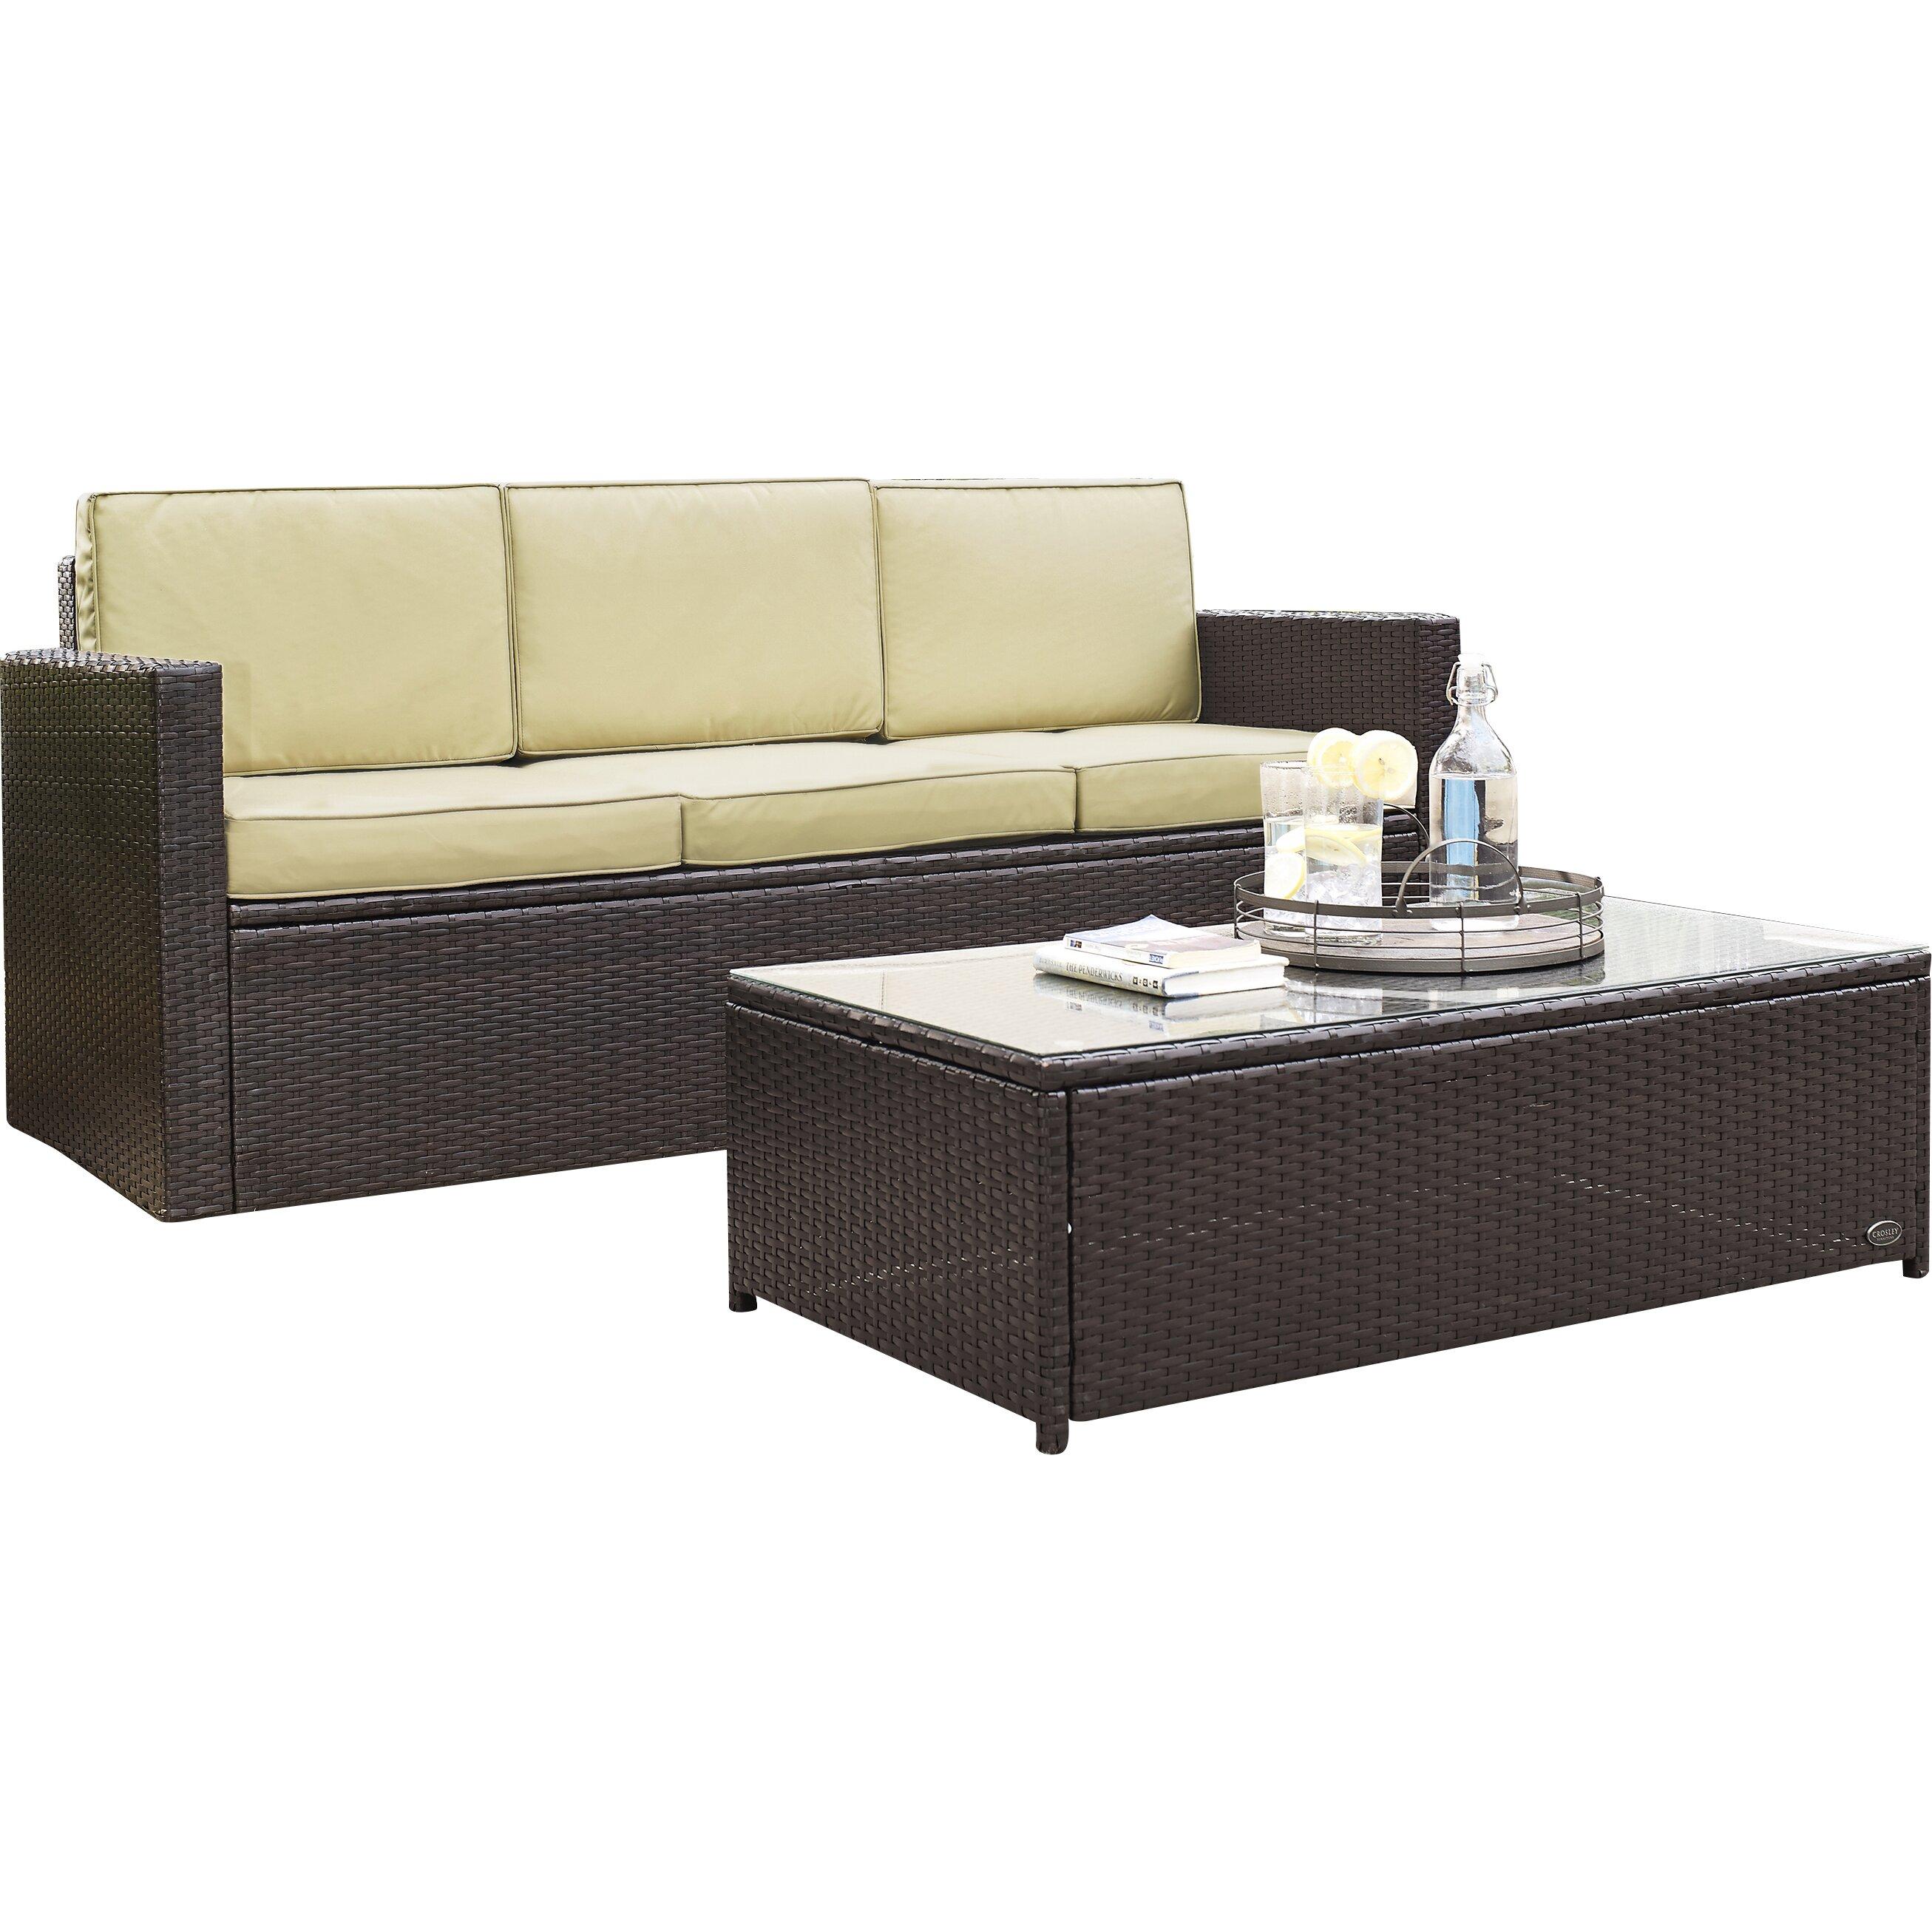 Sofa Under Cushion Support Do It Yourself Divas Diy Strip Fabric